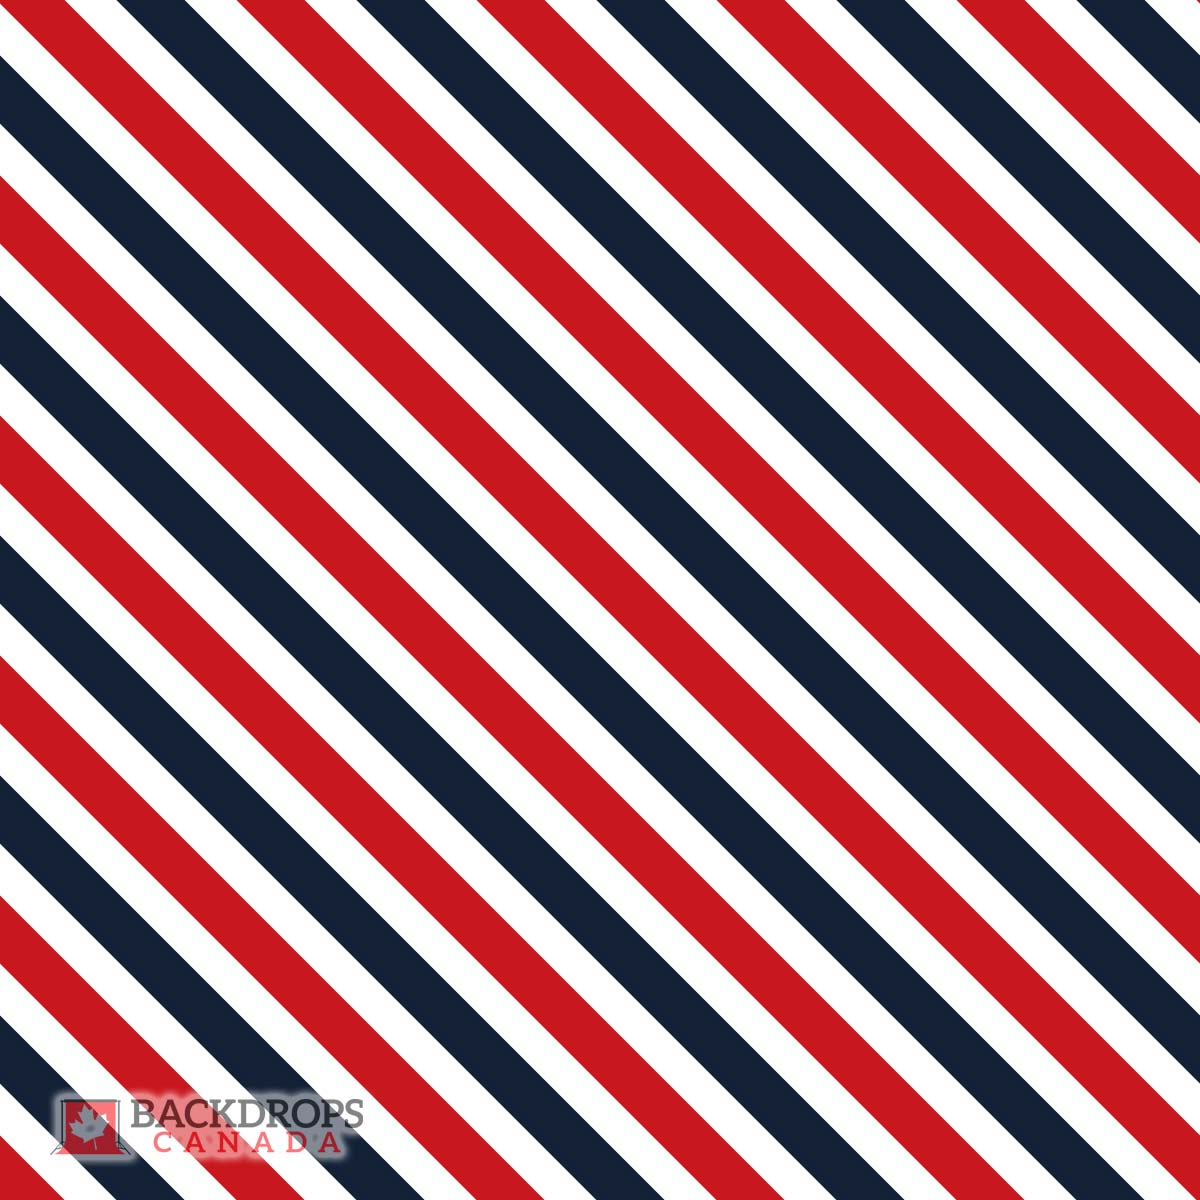 barber stripes backdrops canada